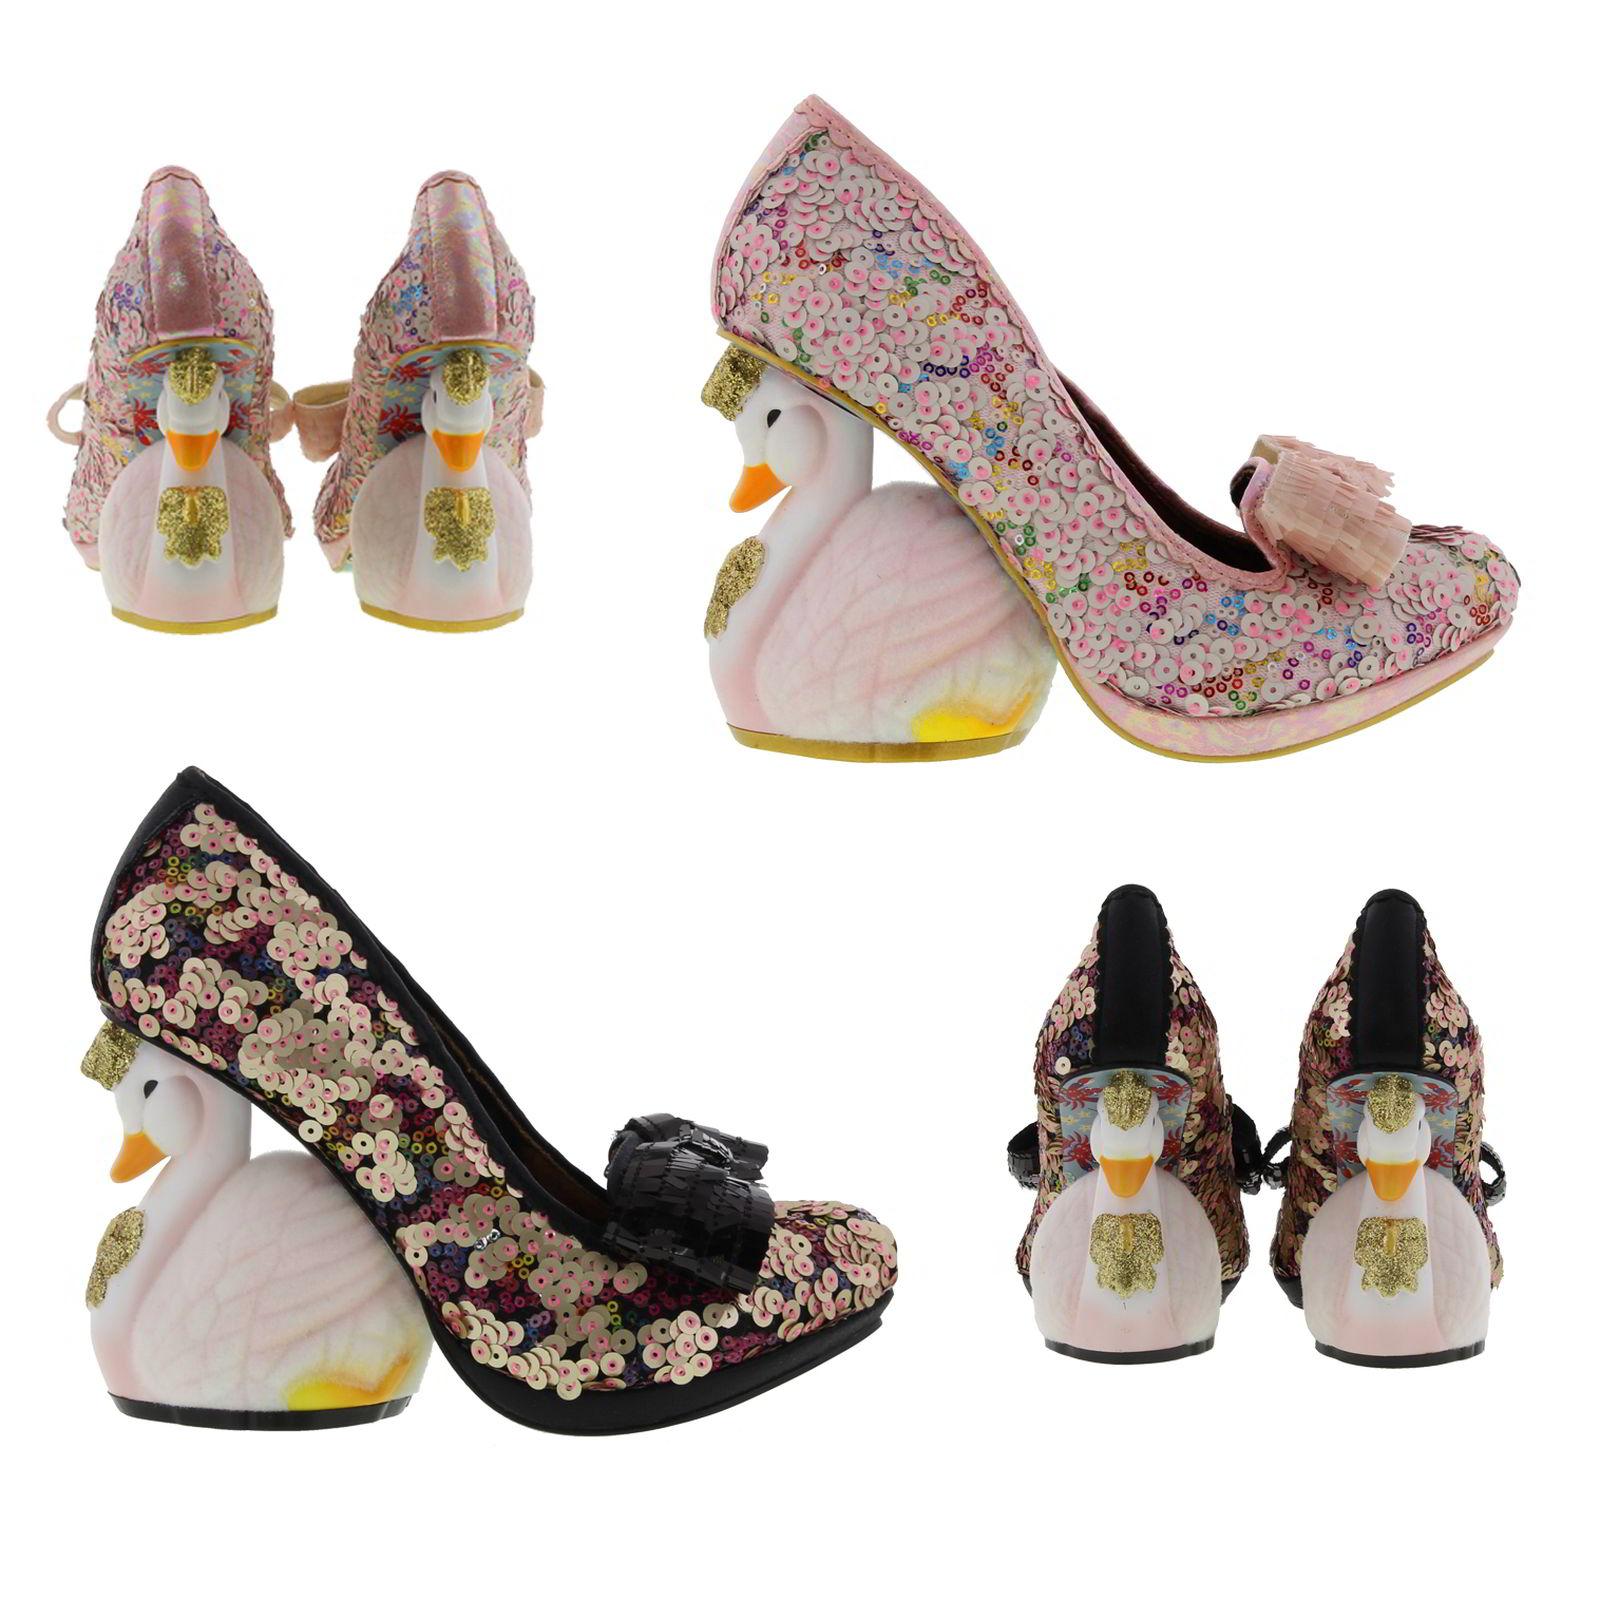 irregular choice savan swan heel womens wedding party shoes size uk 4 8 ebay. Black Bedroom Furniture Sets. Home Design Ideas